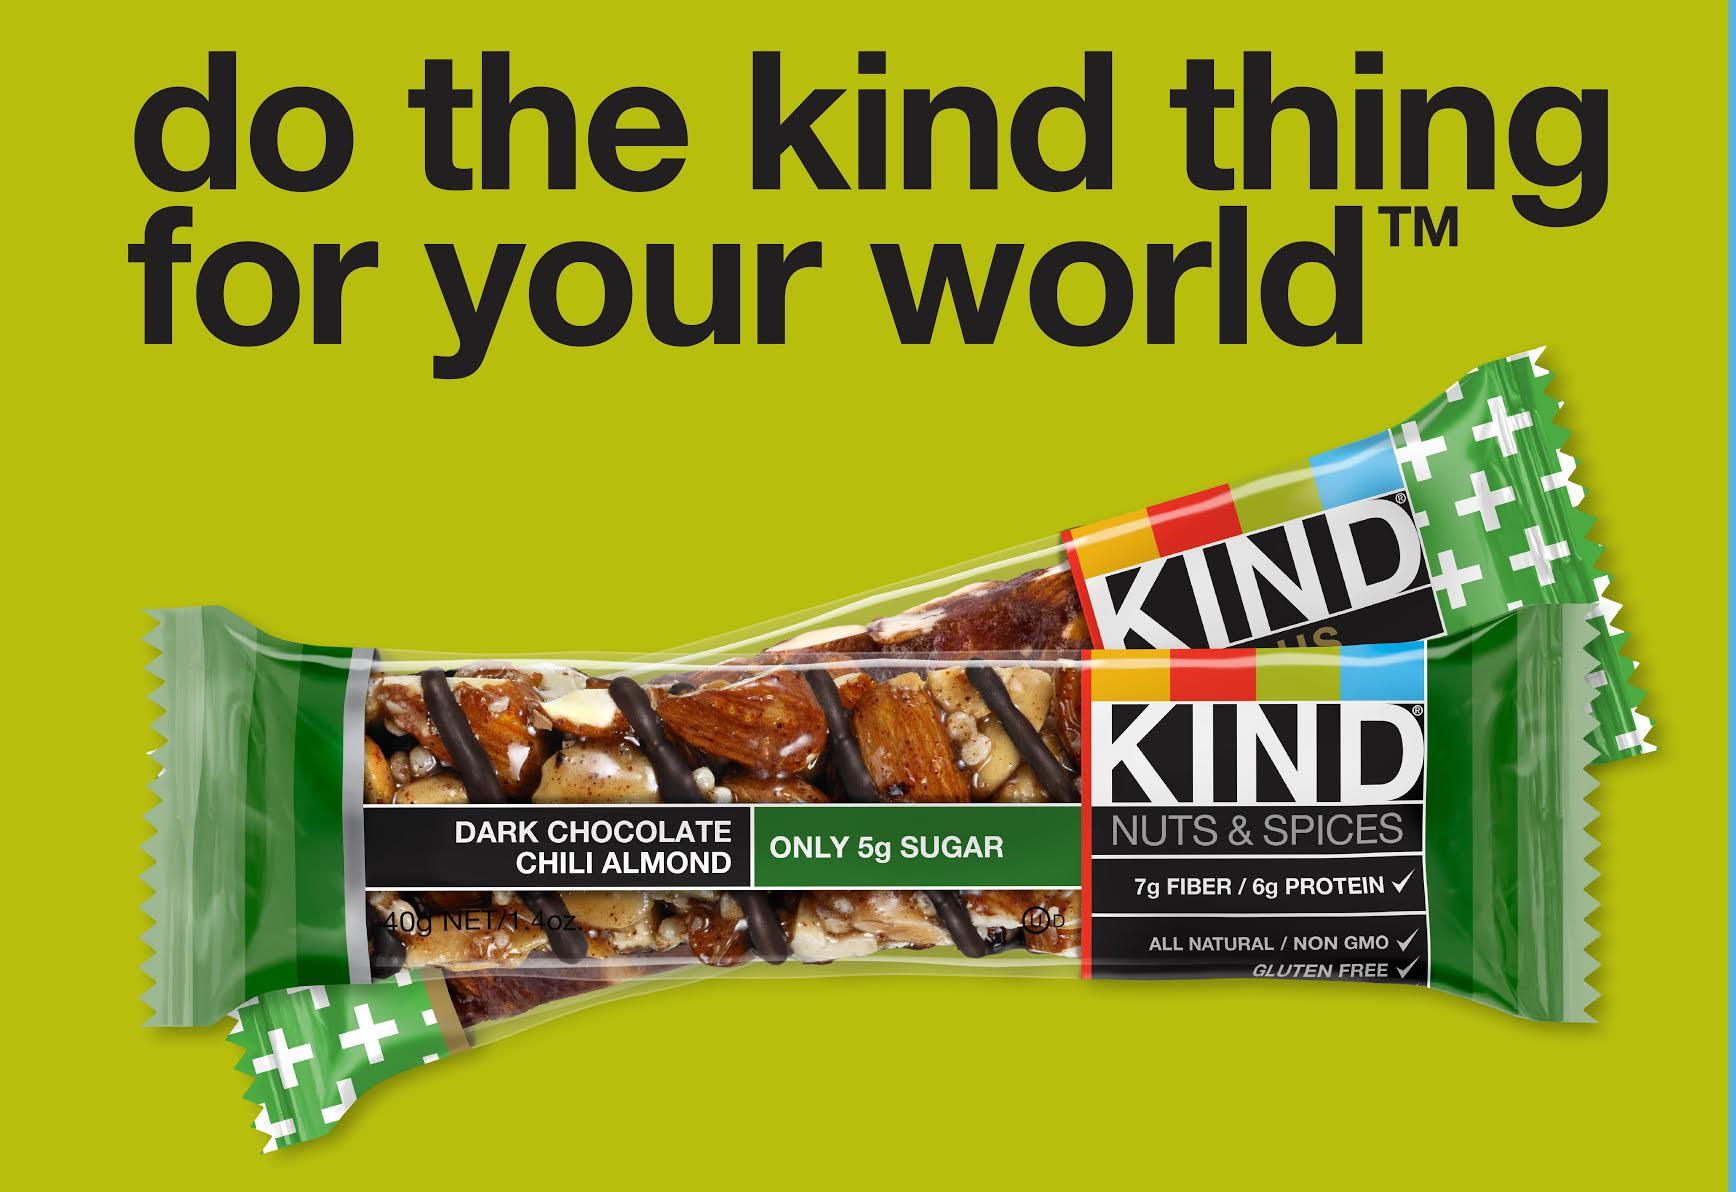 KIND Snacks Ad3: Green - Dark Chocolate Chili Almond